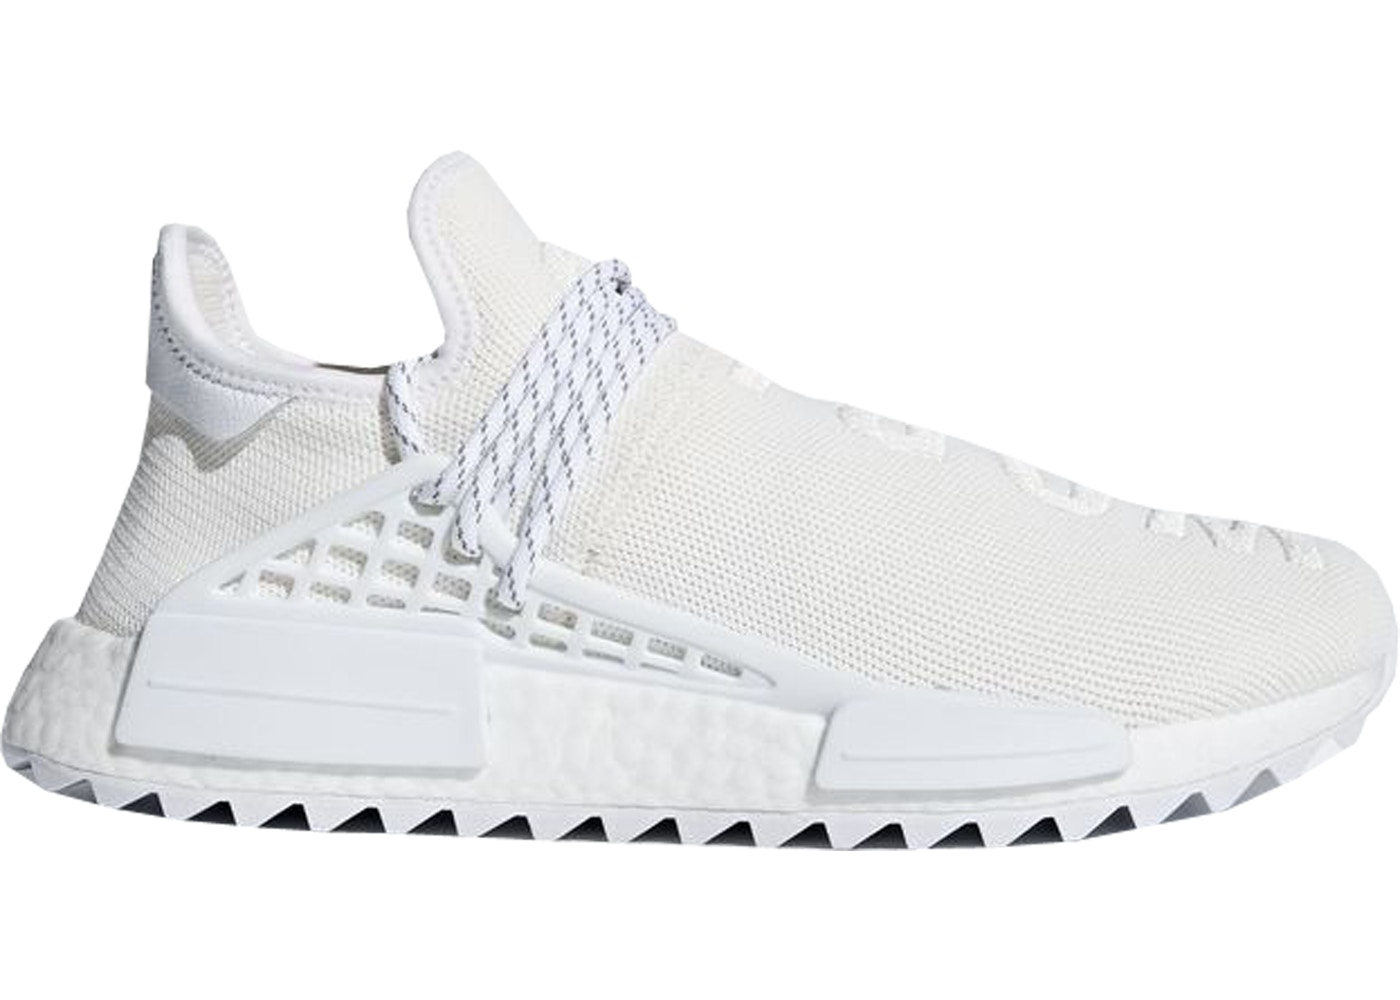 adidas Human Race NMD Pharrell Blank Canvas クリームホワイト/ランニングホワイト/ランニングホワイト